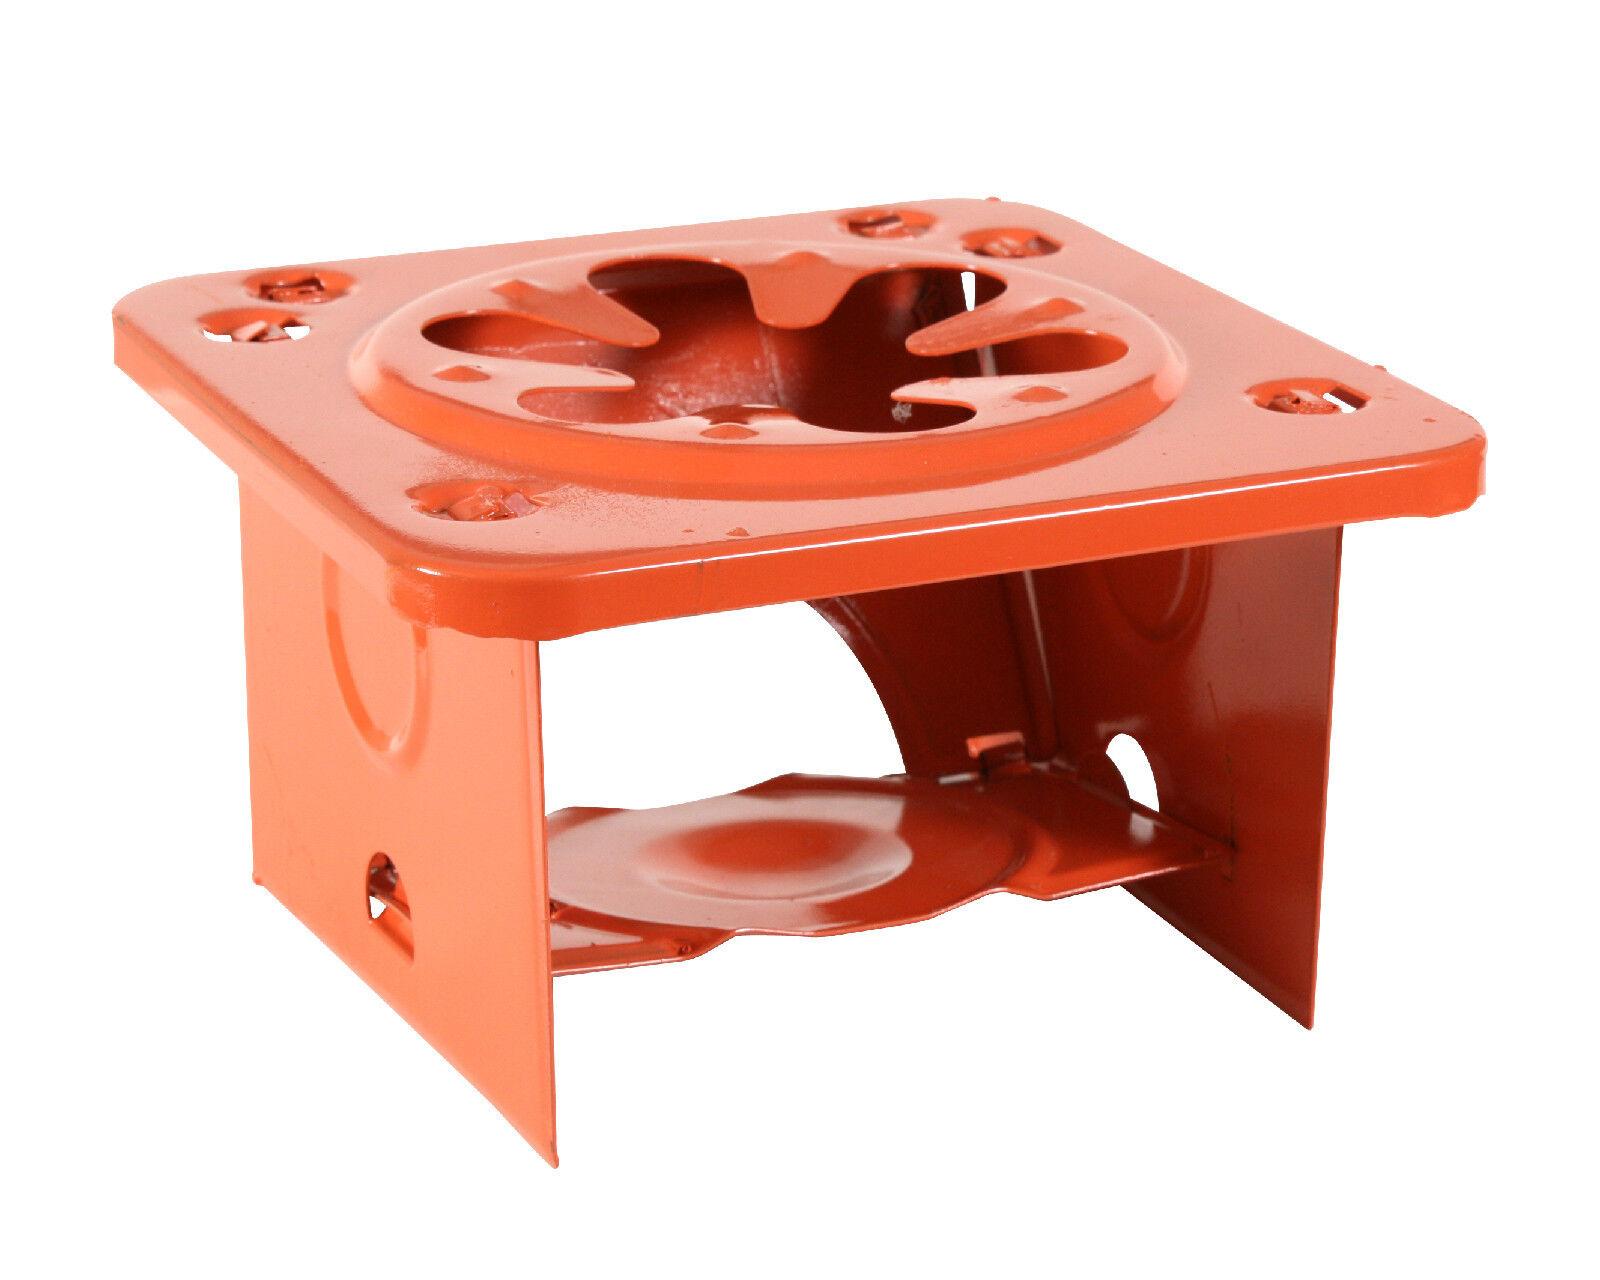 Single burner folding stove camping safe and compact orange redhco 365